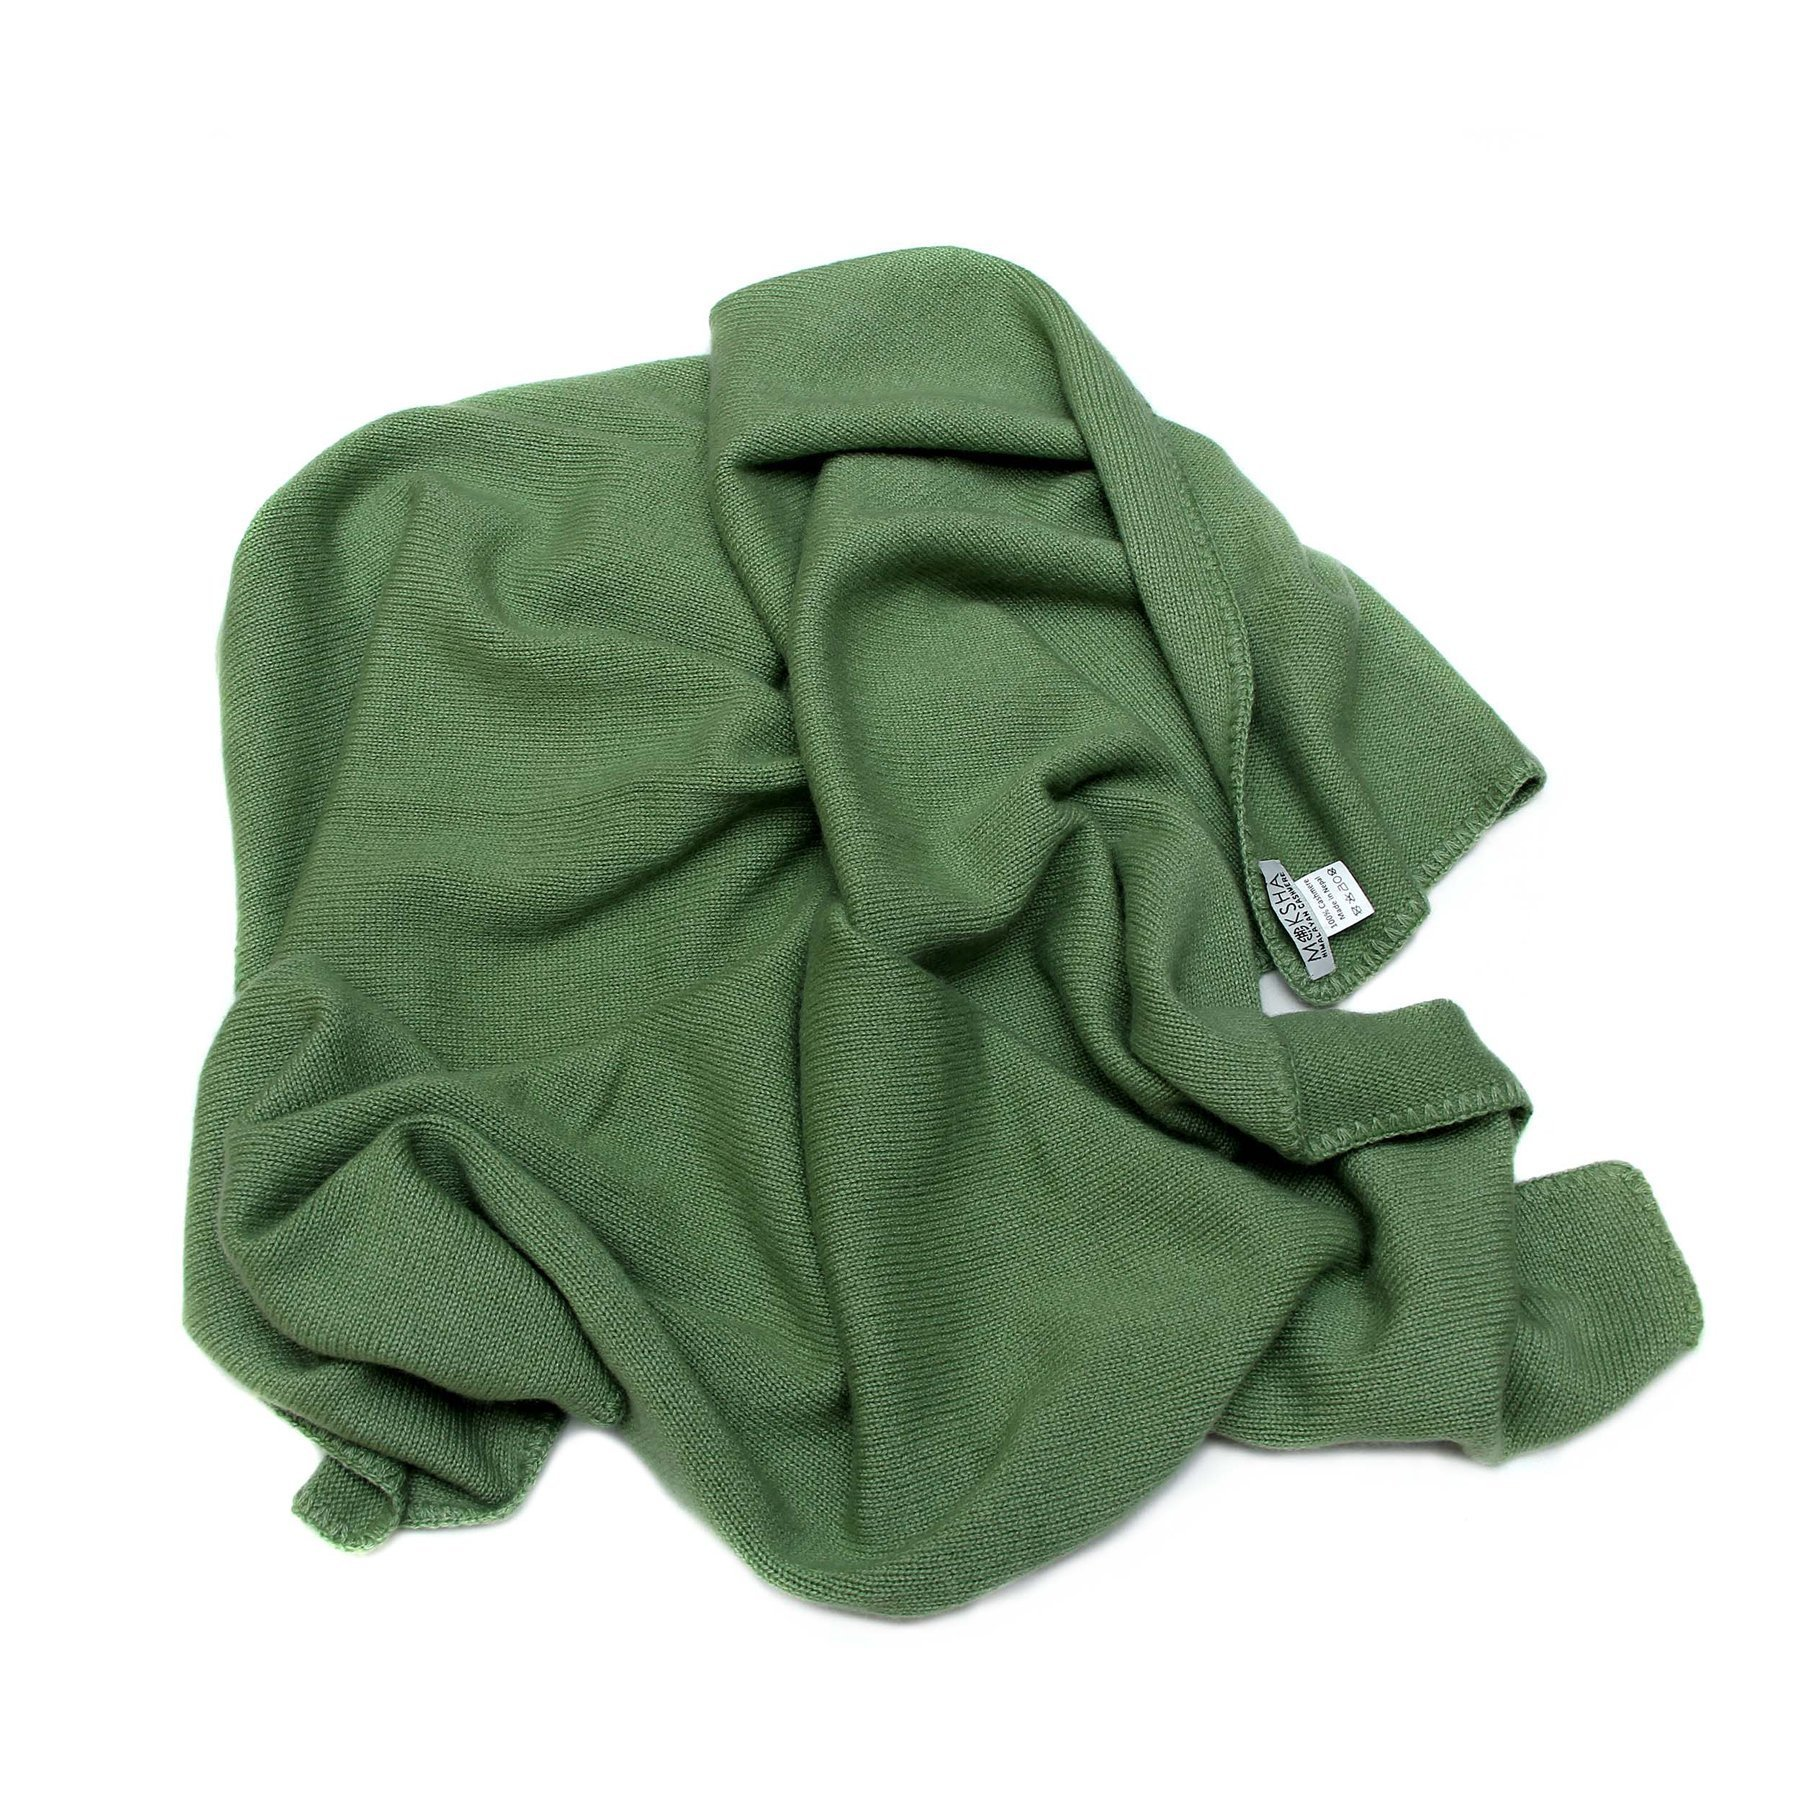 100% Cashmere Baby Blanket, 4 Ply Mongolian 26/2 Yarn Cashmere, Hand-Knitted, Green © Moksha Cashmere by Moksha Cashmere